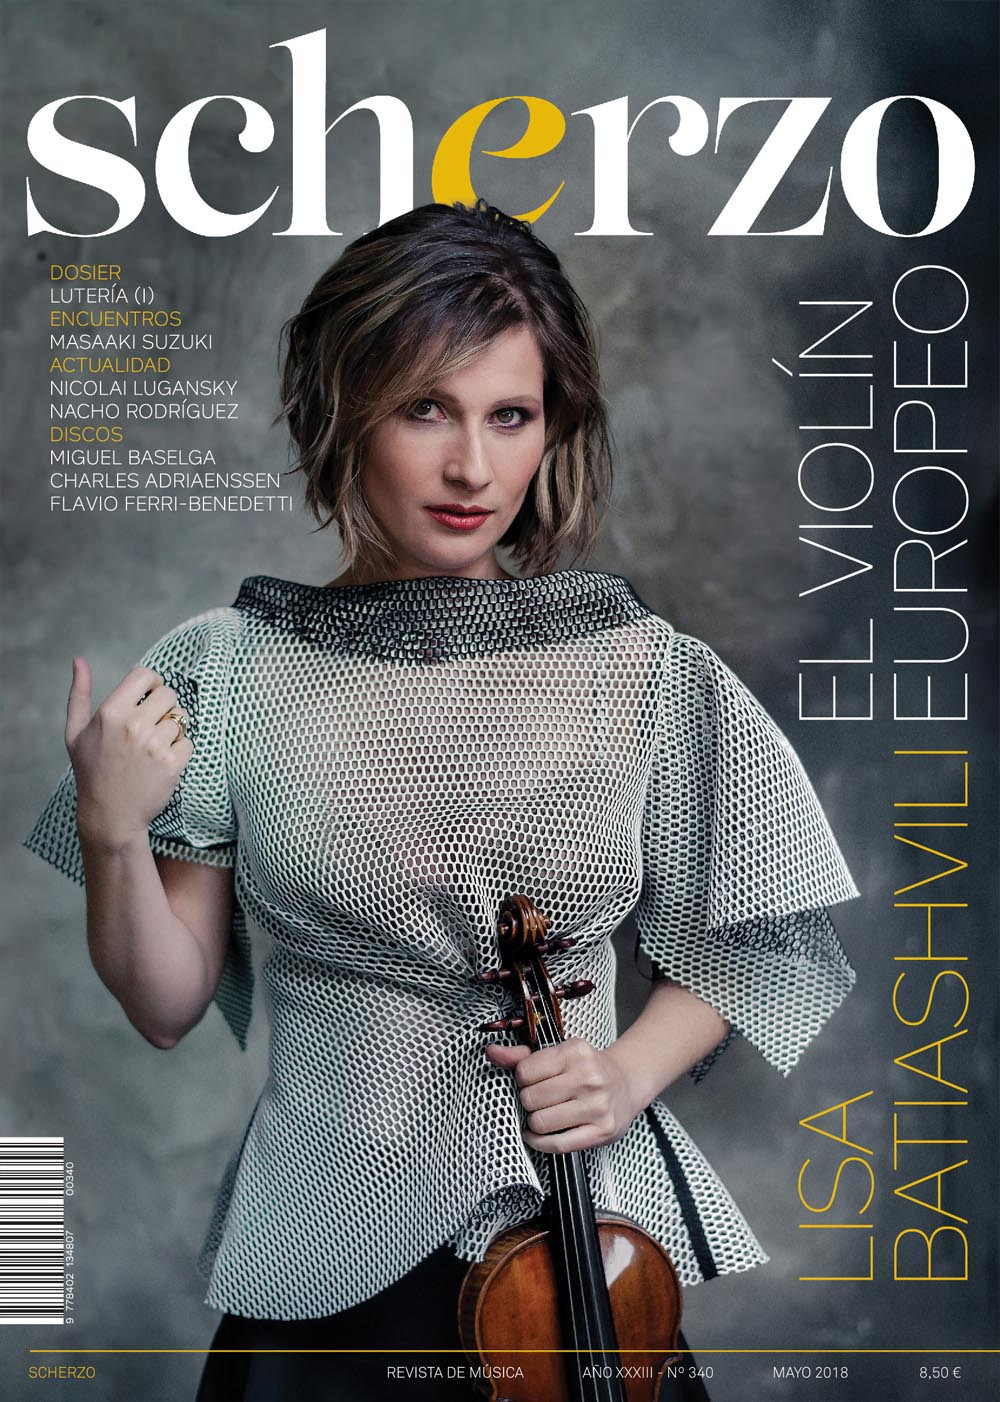 Diseño de portada revista Scherzo Lisa Batiashvili